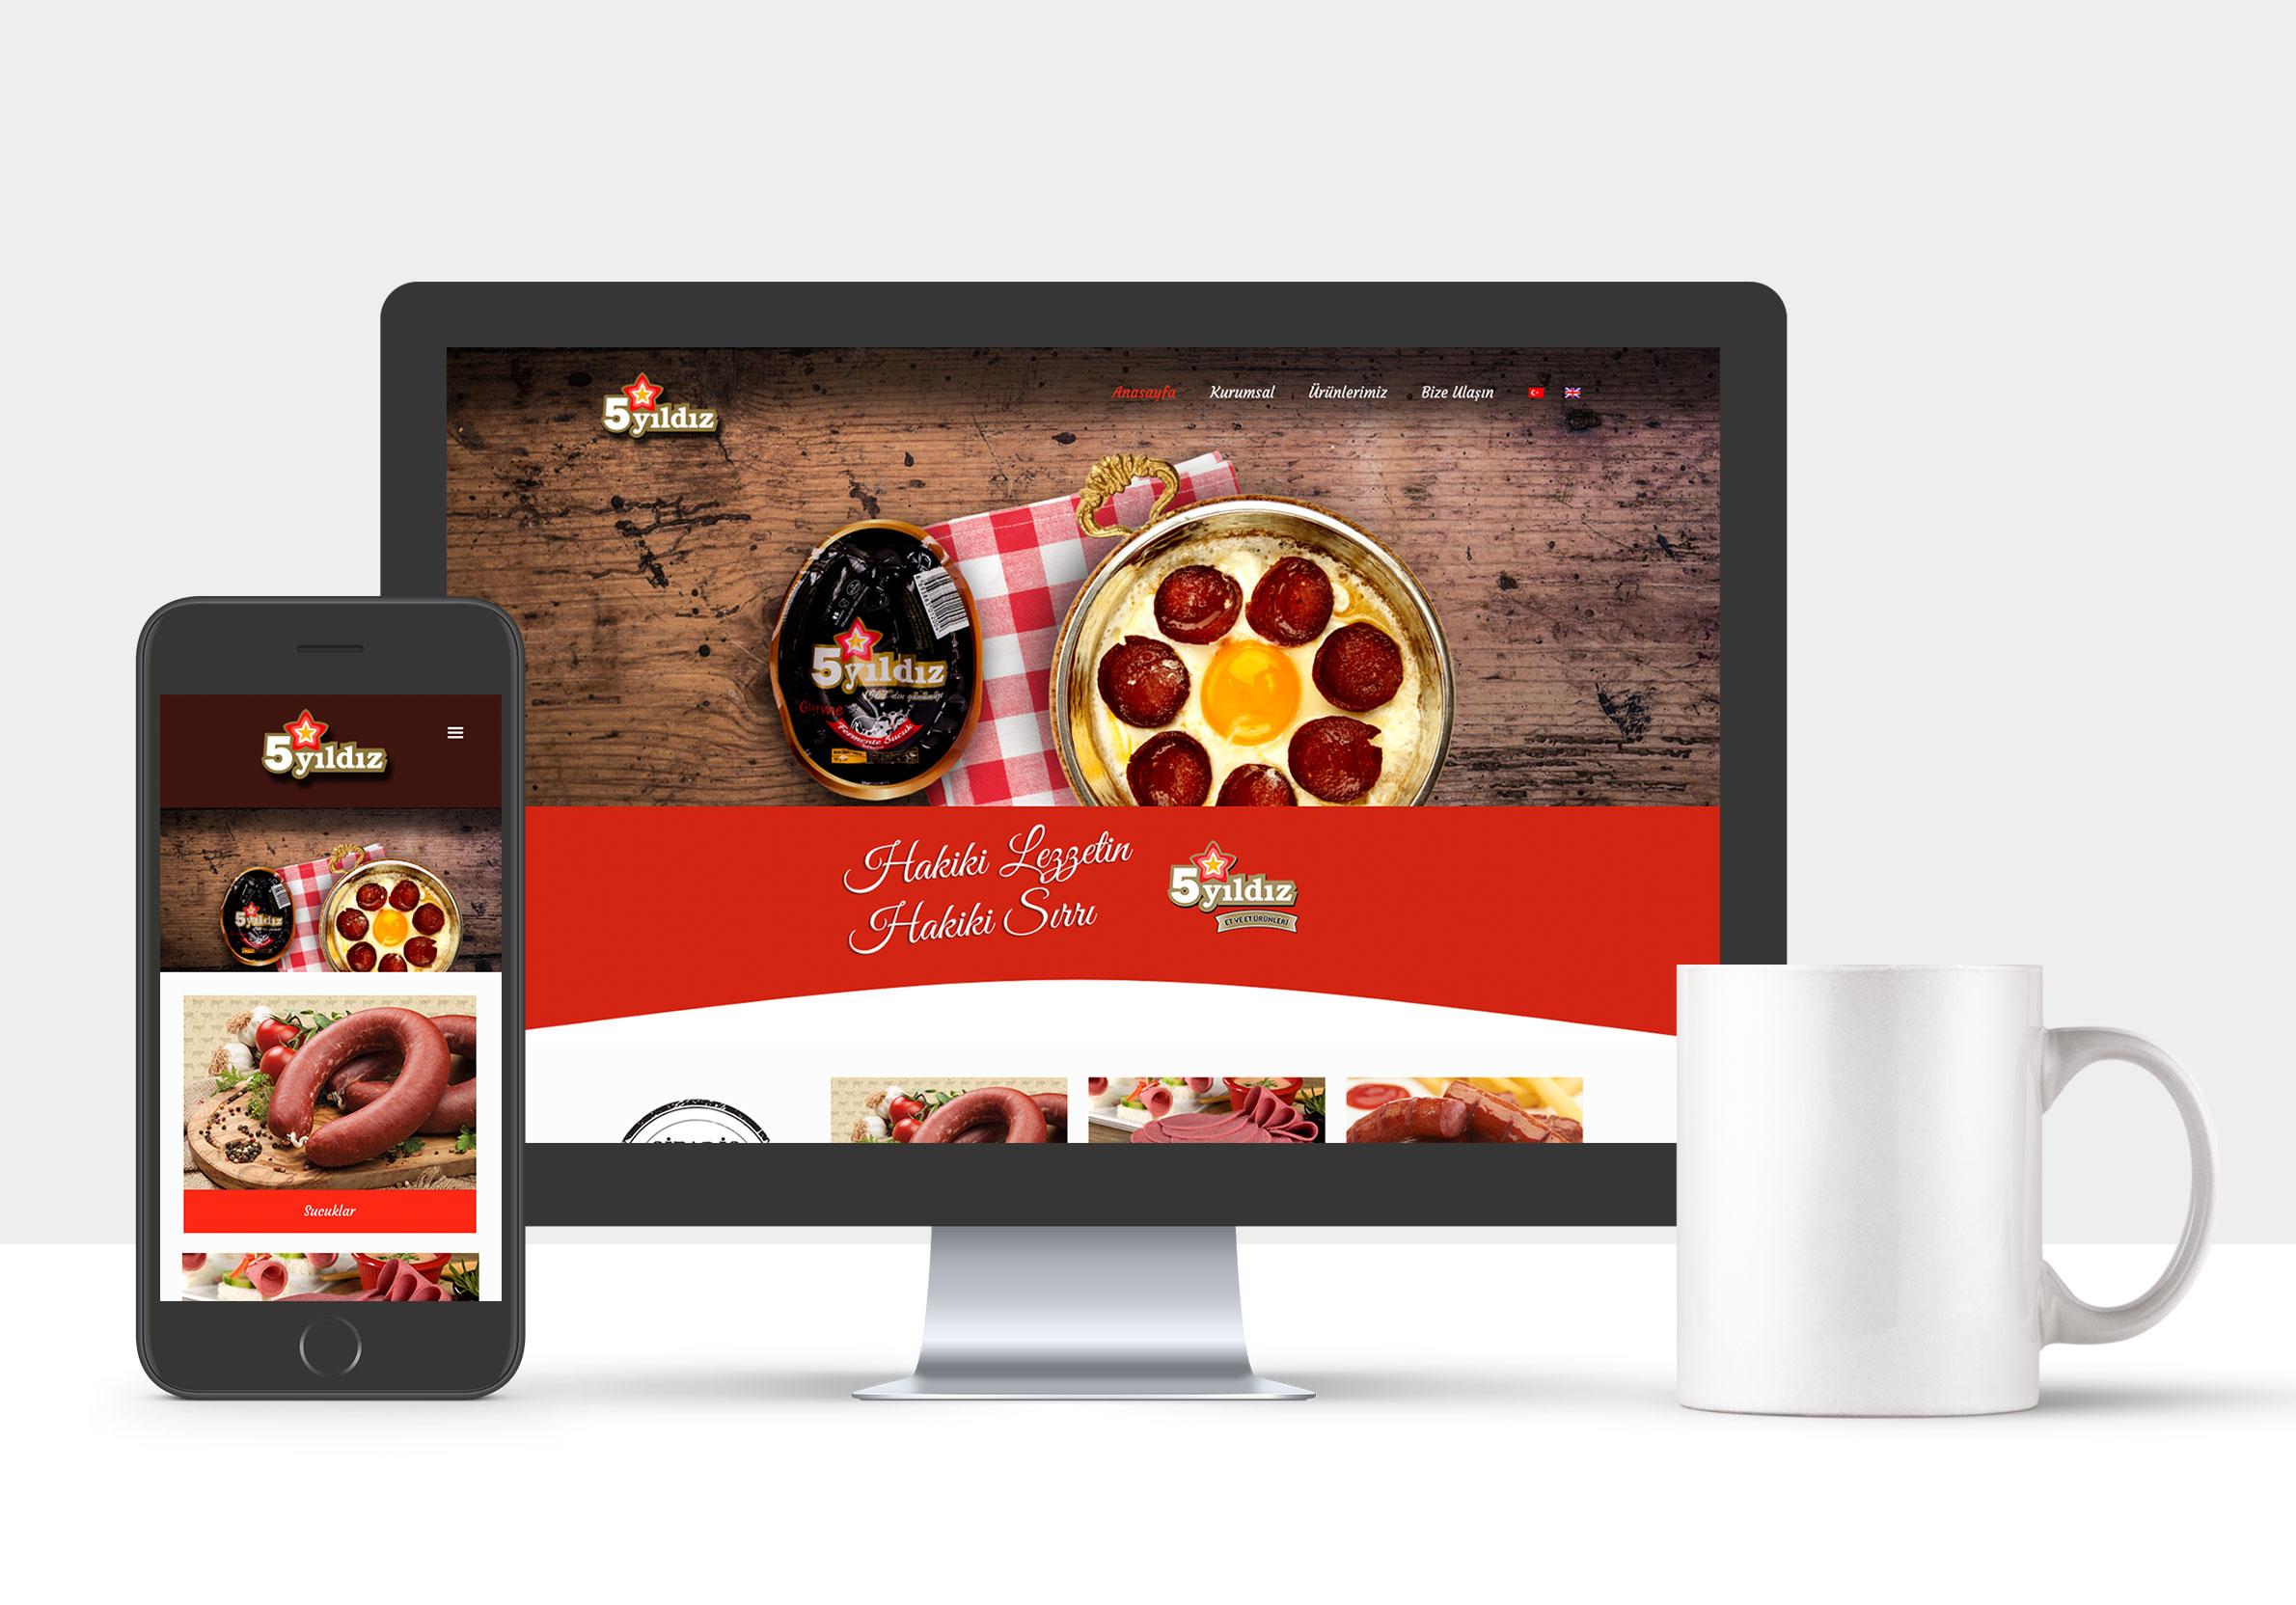 5-yildiz-kurumsal-web-tasarim